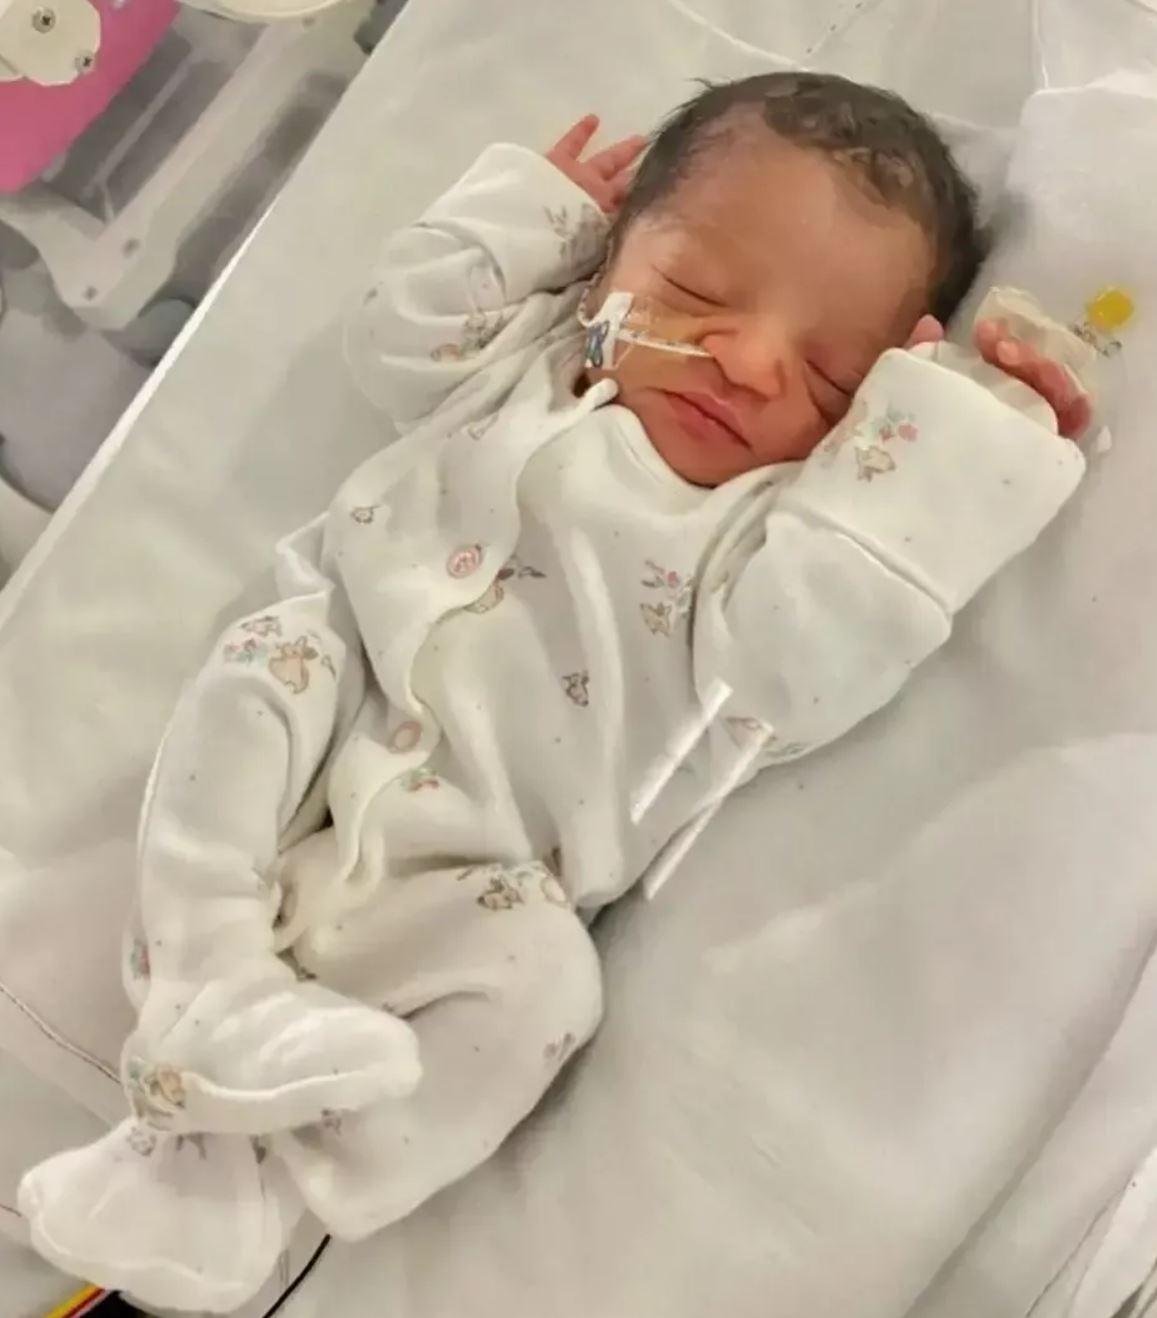 Sharon Oyakhilome welcomes daughter